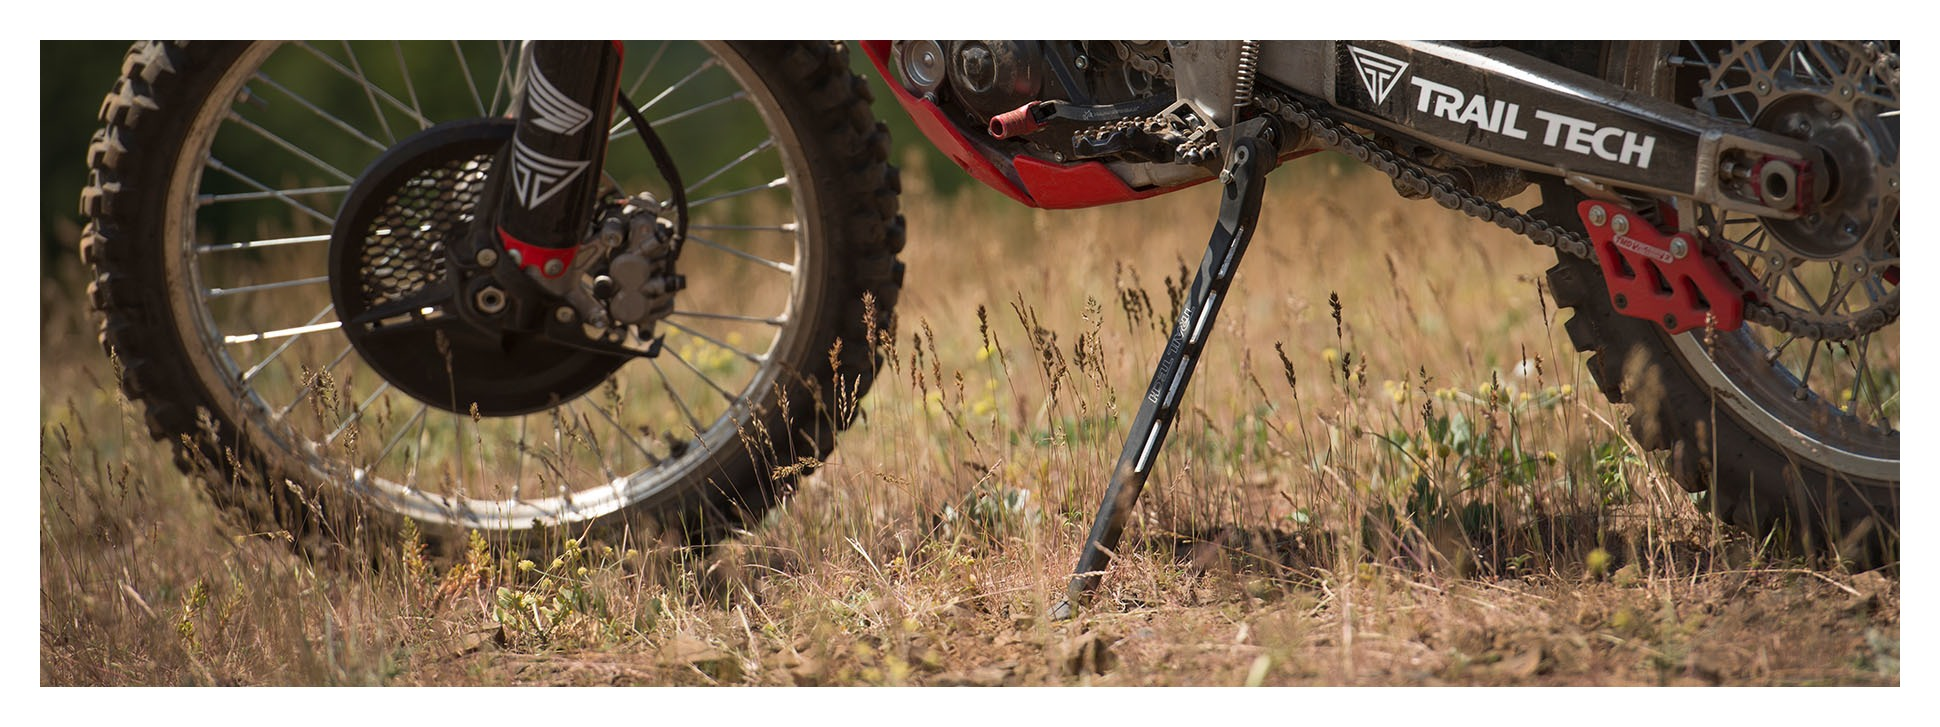 For Honda CRF150R 2007-2017 Trail Tech Kickstand